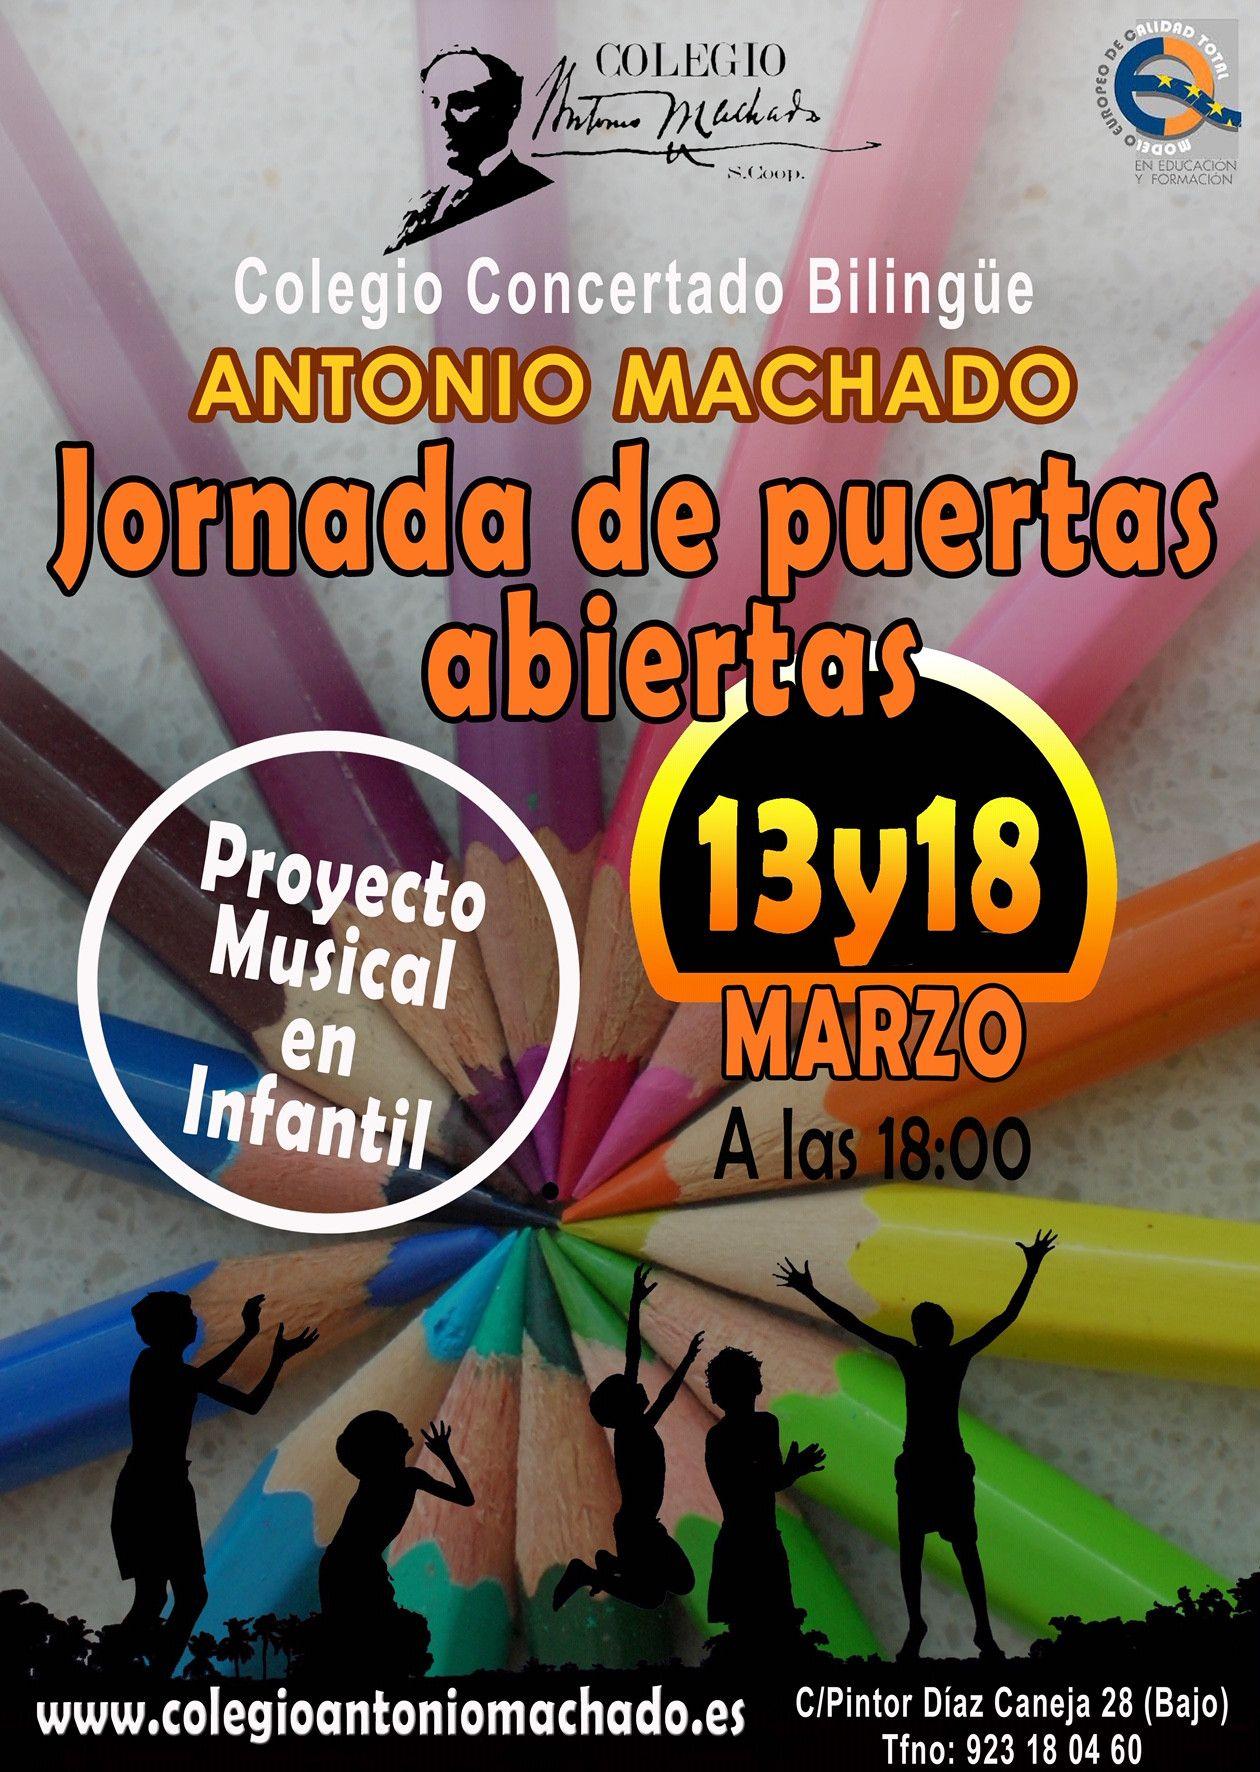 Colegio Antonio Machado (20)